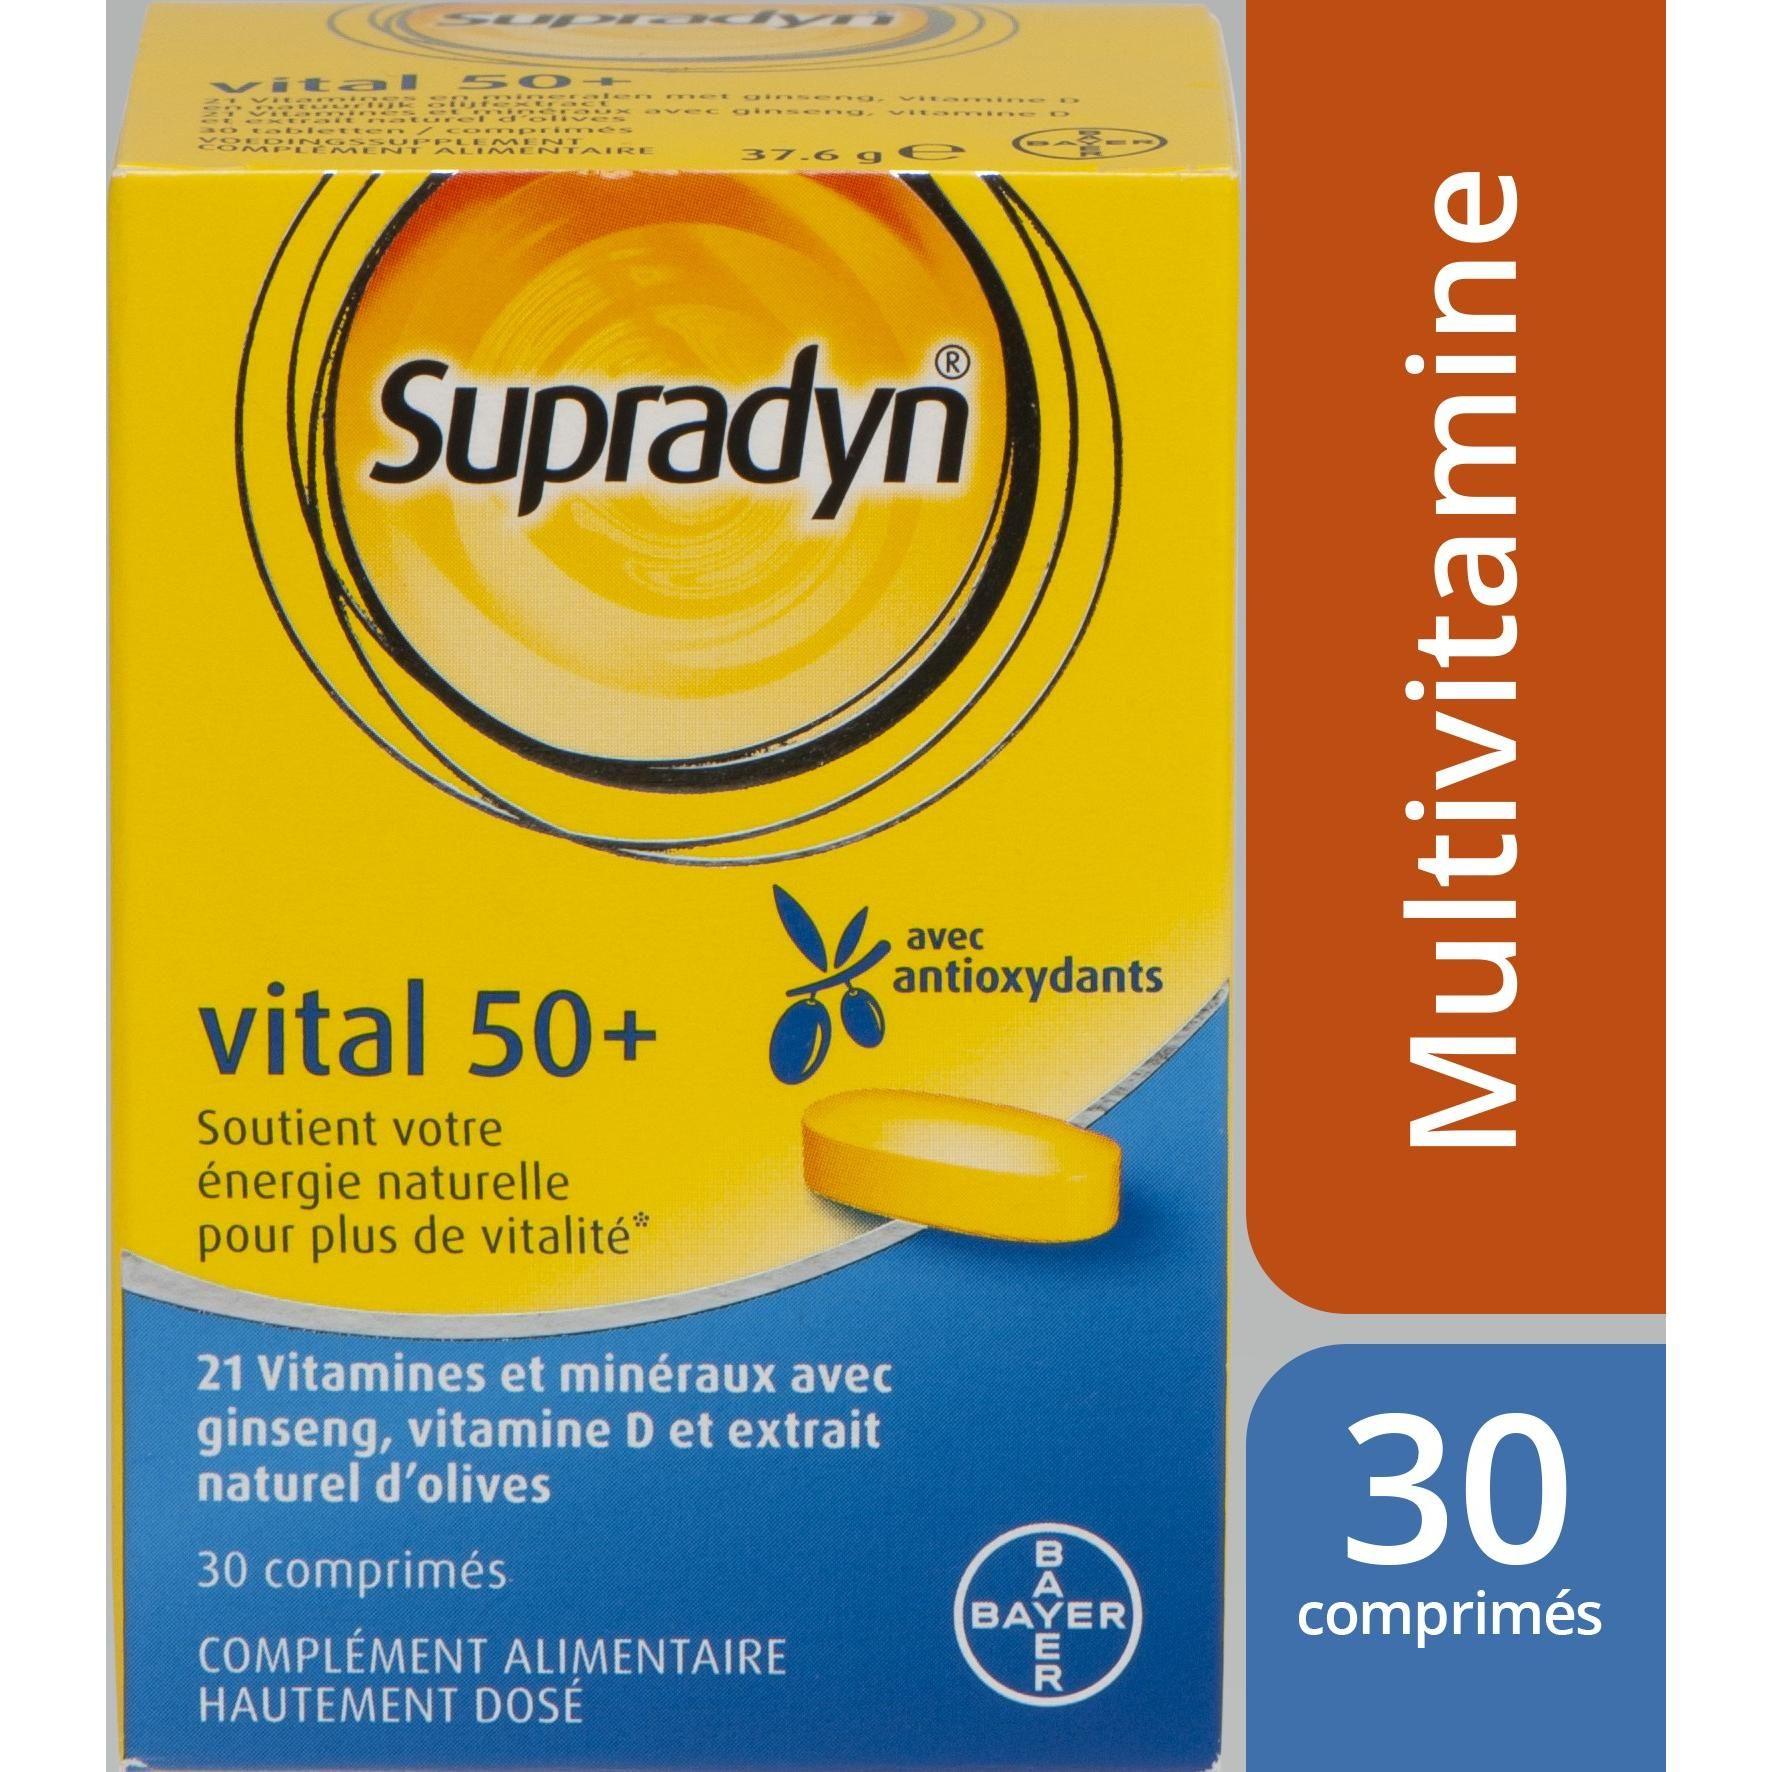 Supradyn Energy cu Coenzima Q10, 30 comprimate, Bayer : Farmacia Tei online